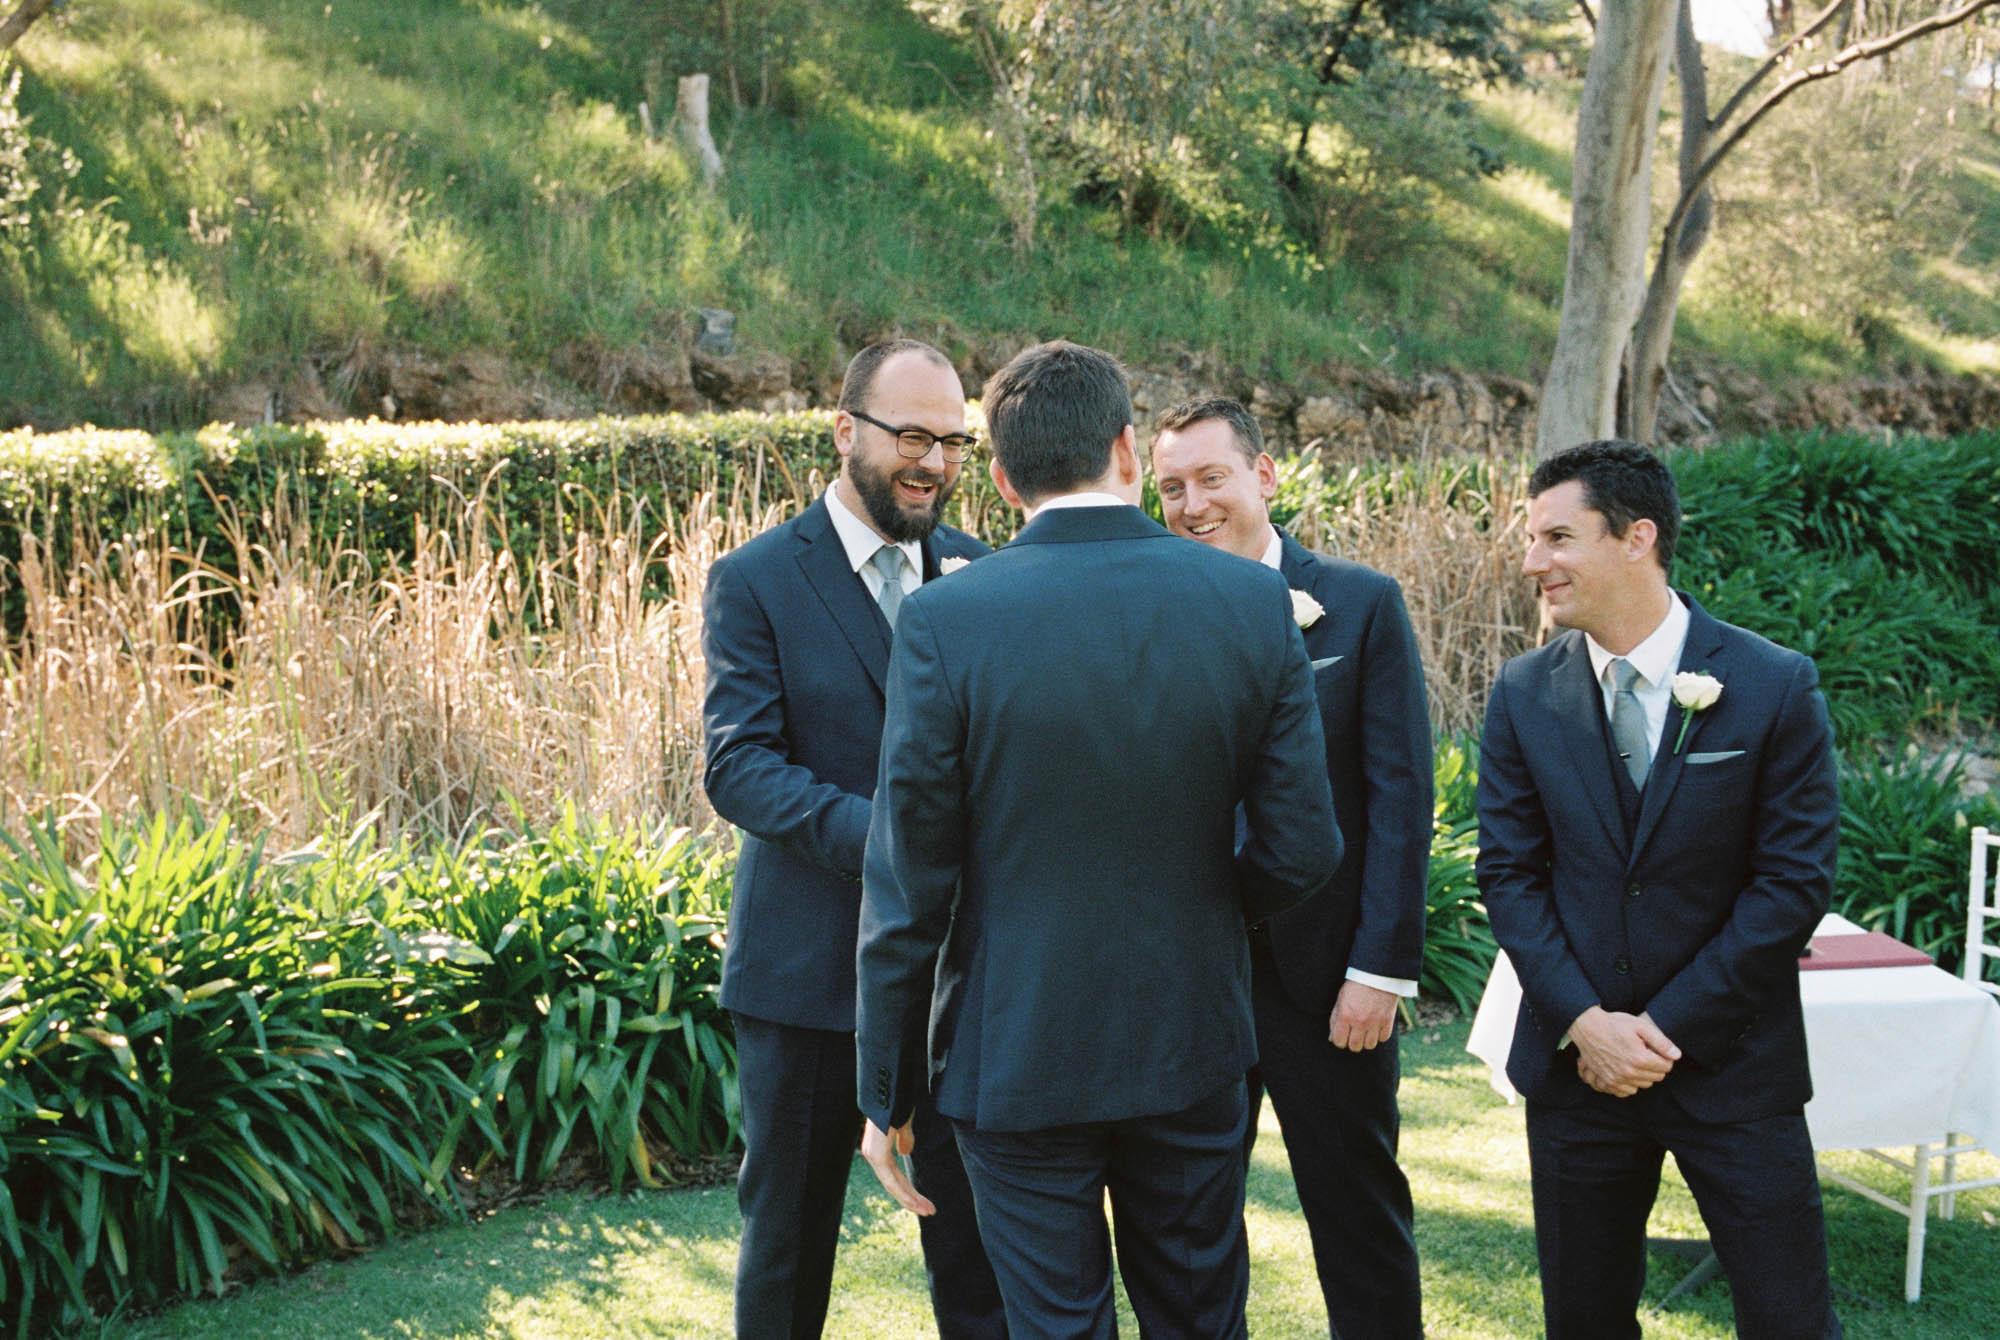 Glen-Ewin-Estate-wedding-photography-027.jpg